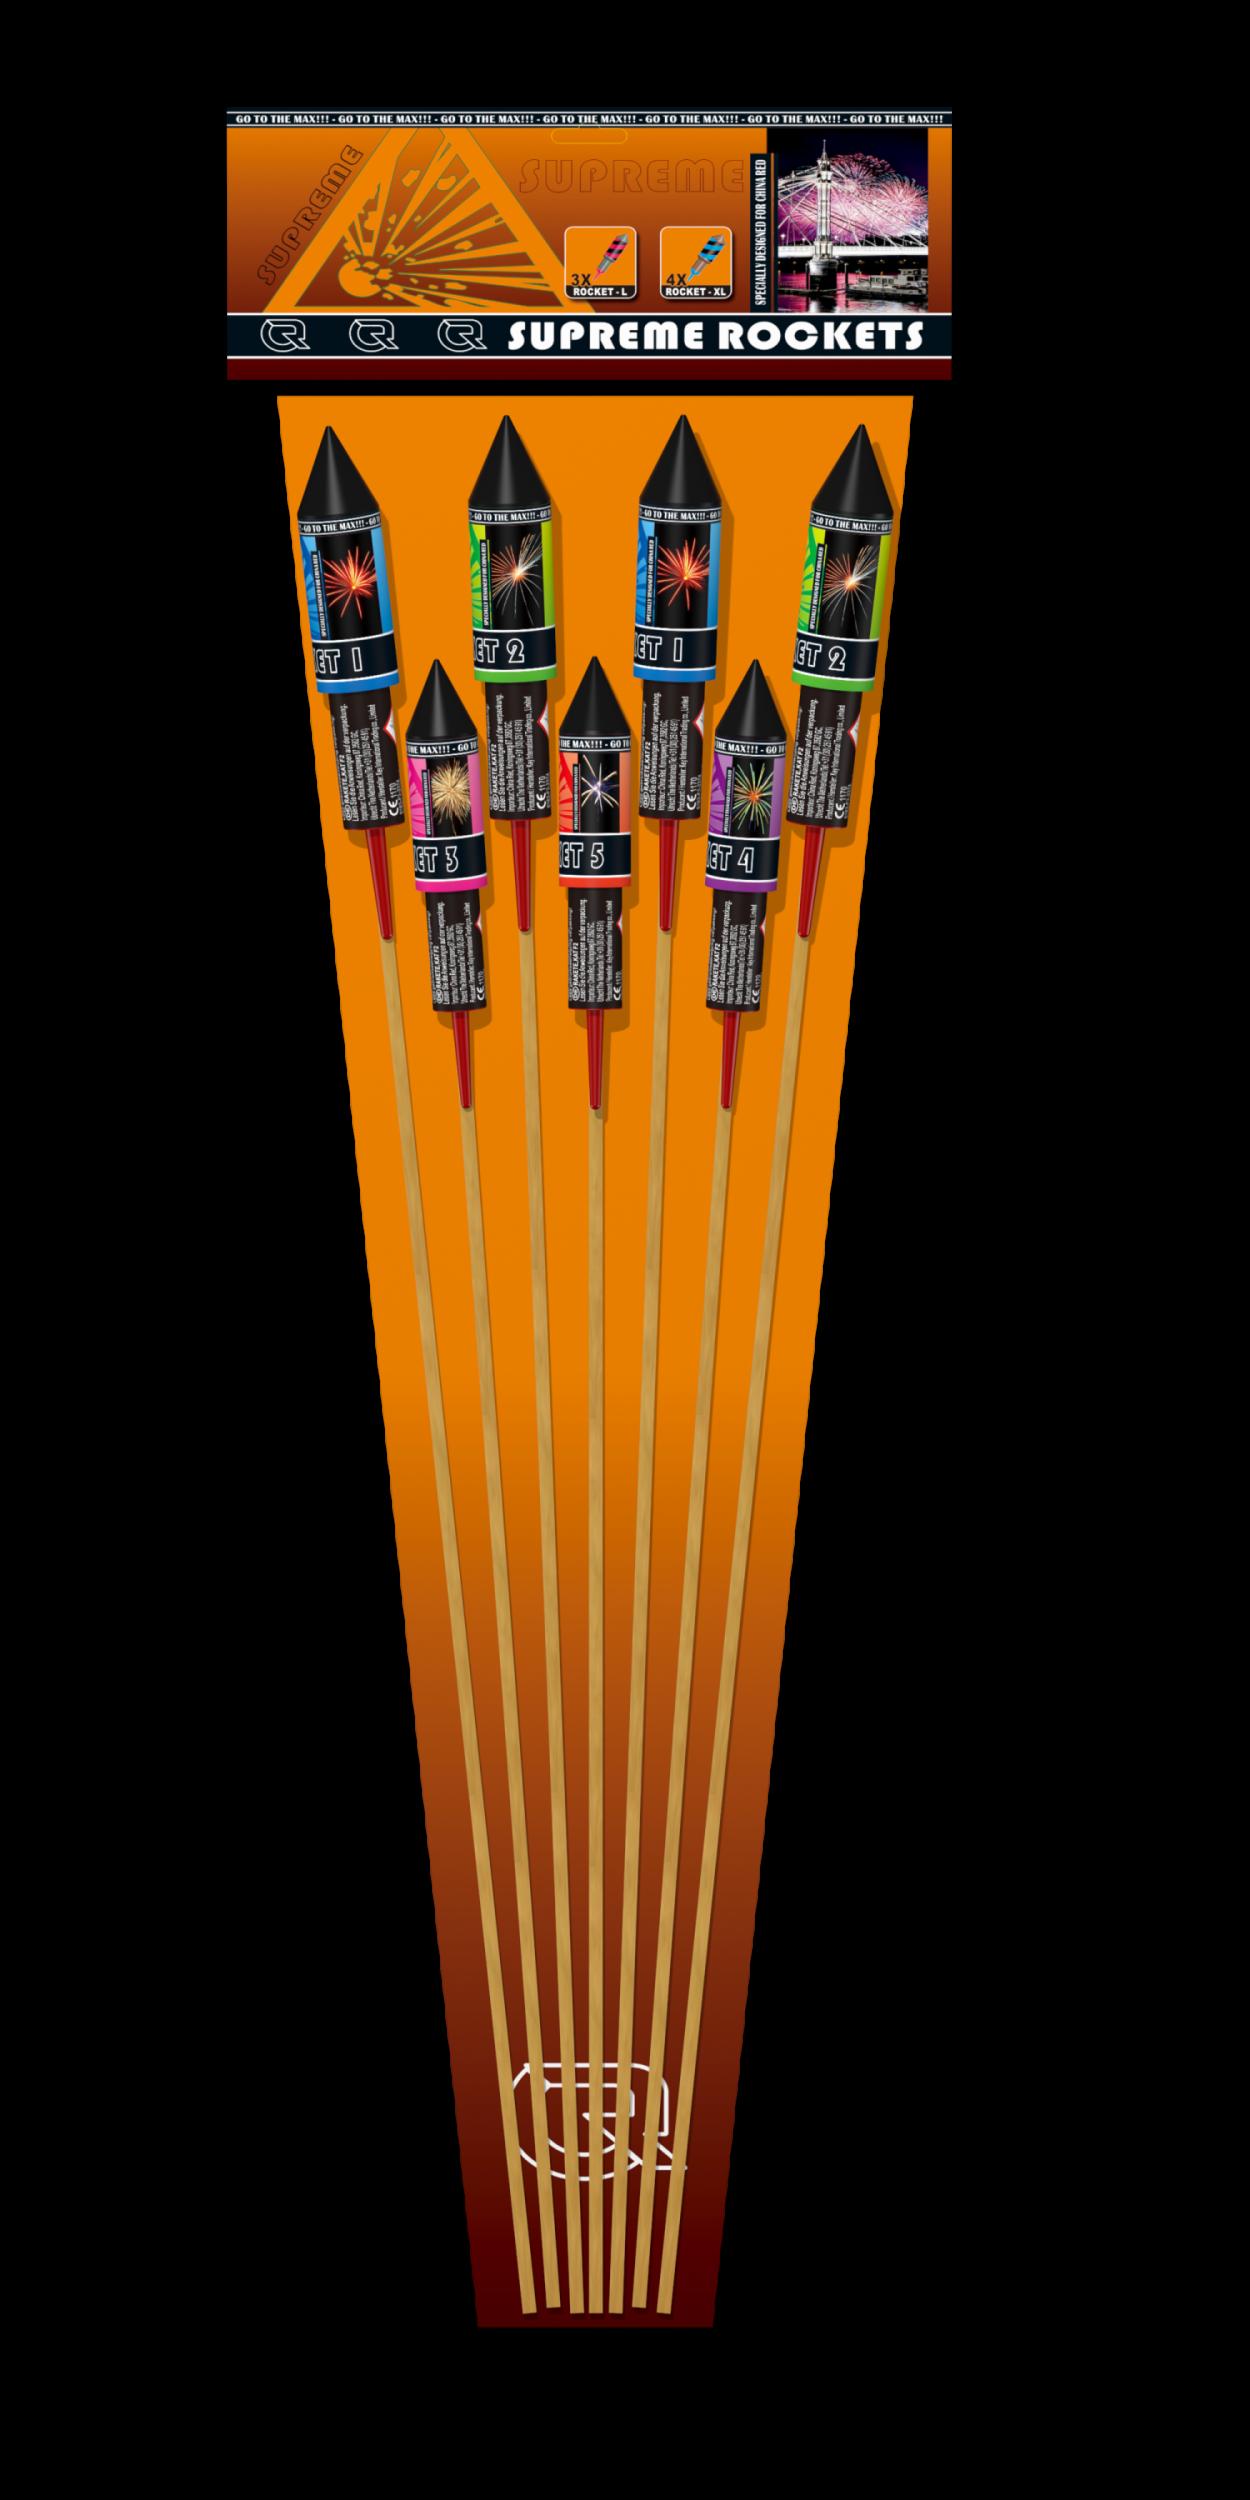 Supreme Rockets